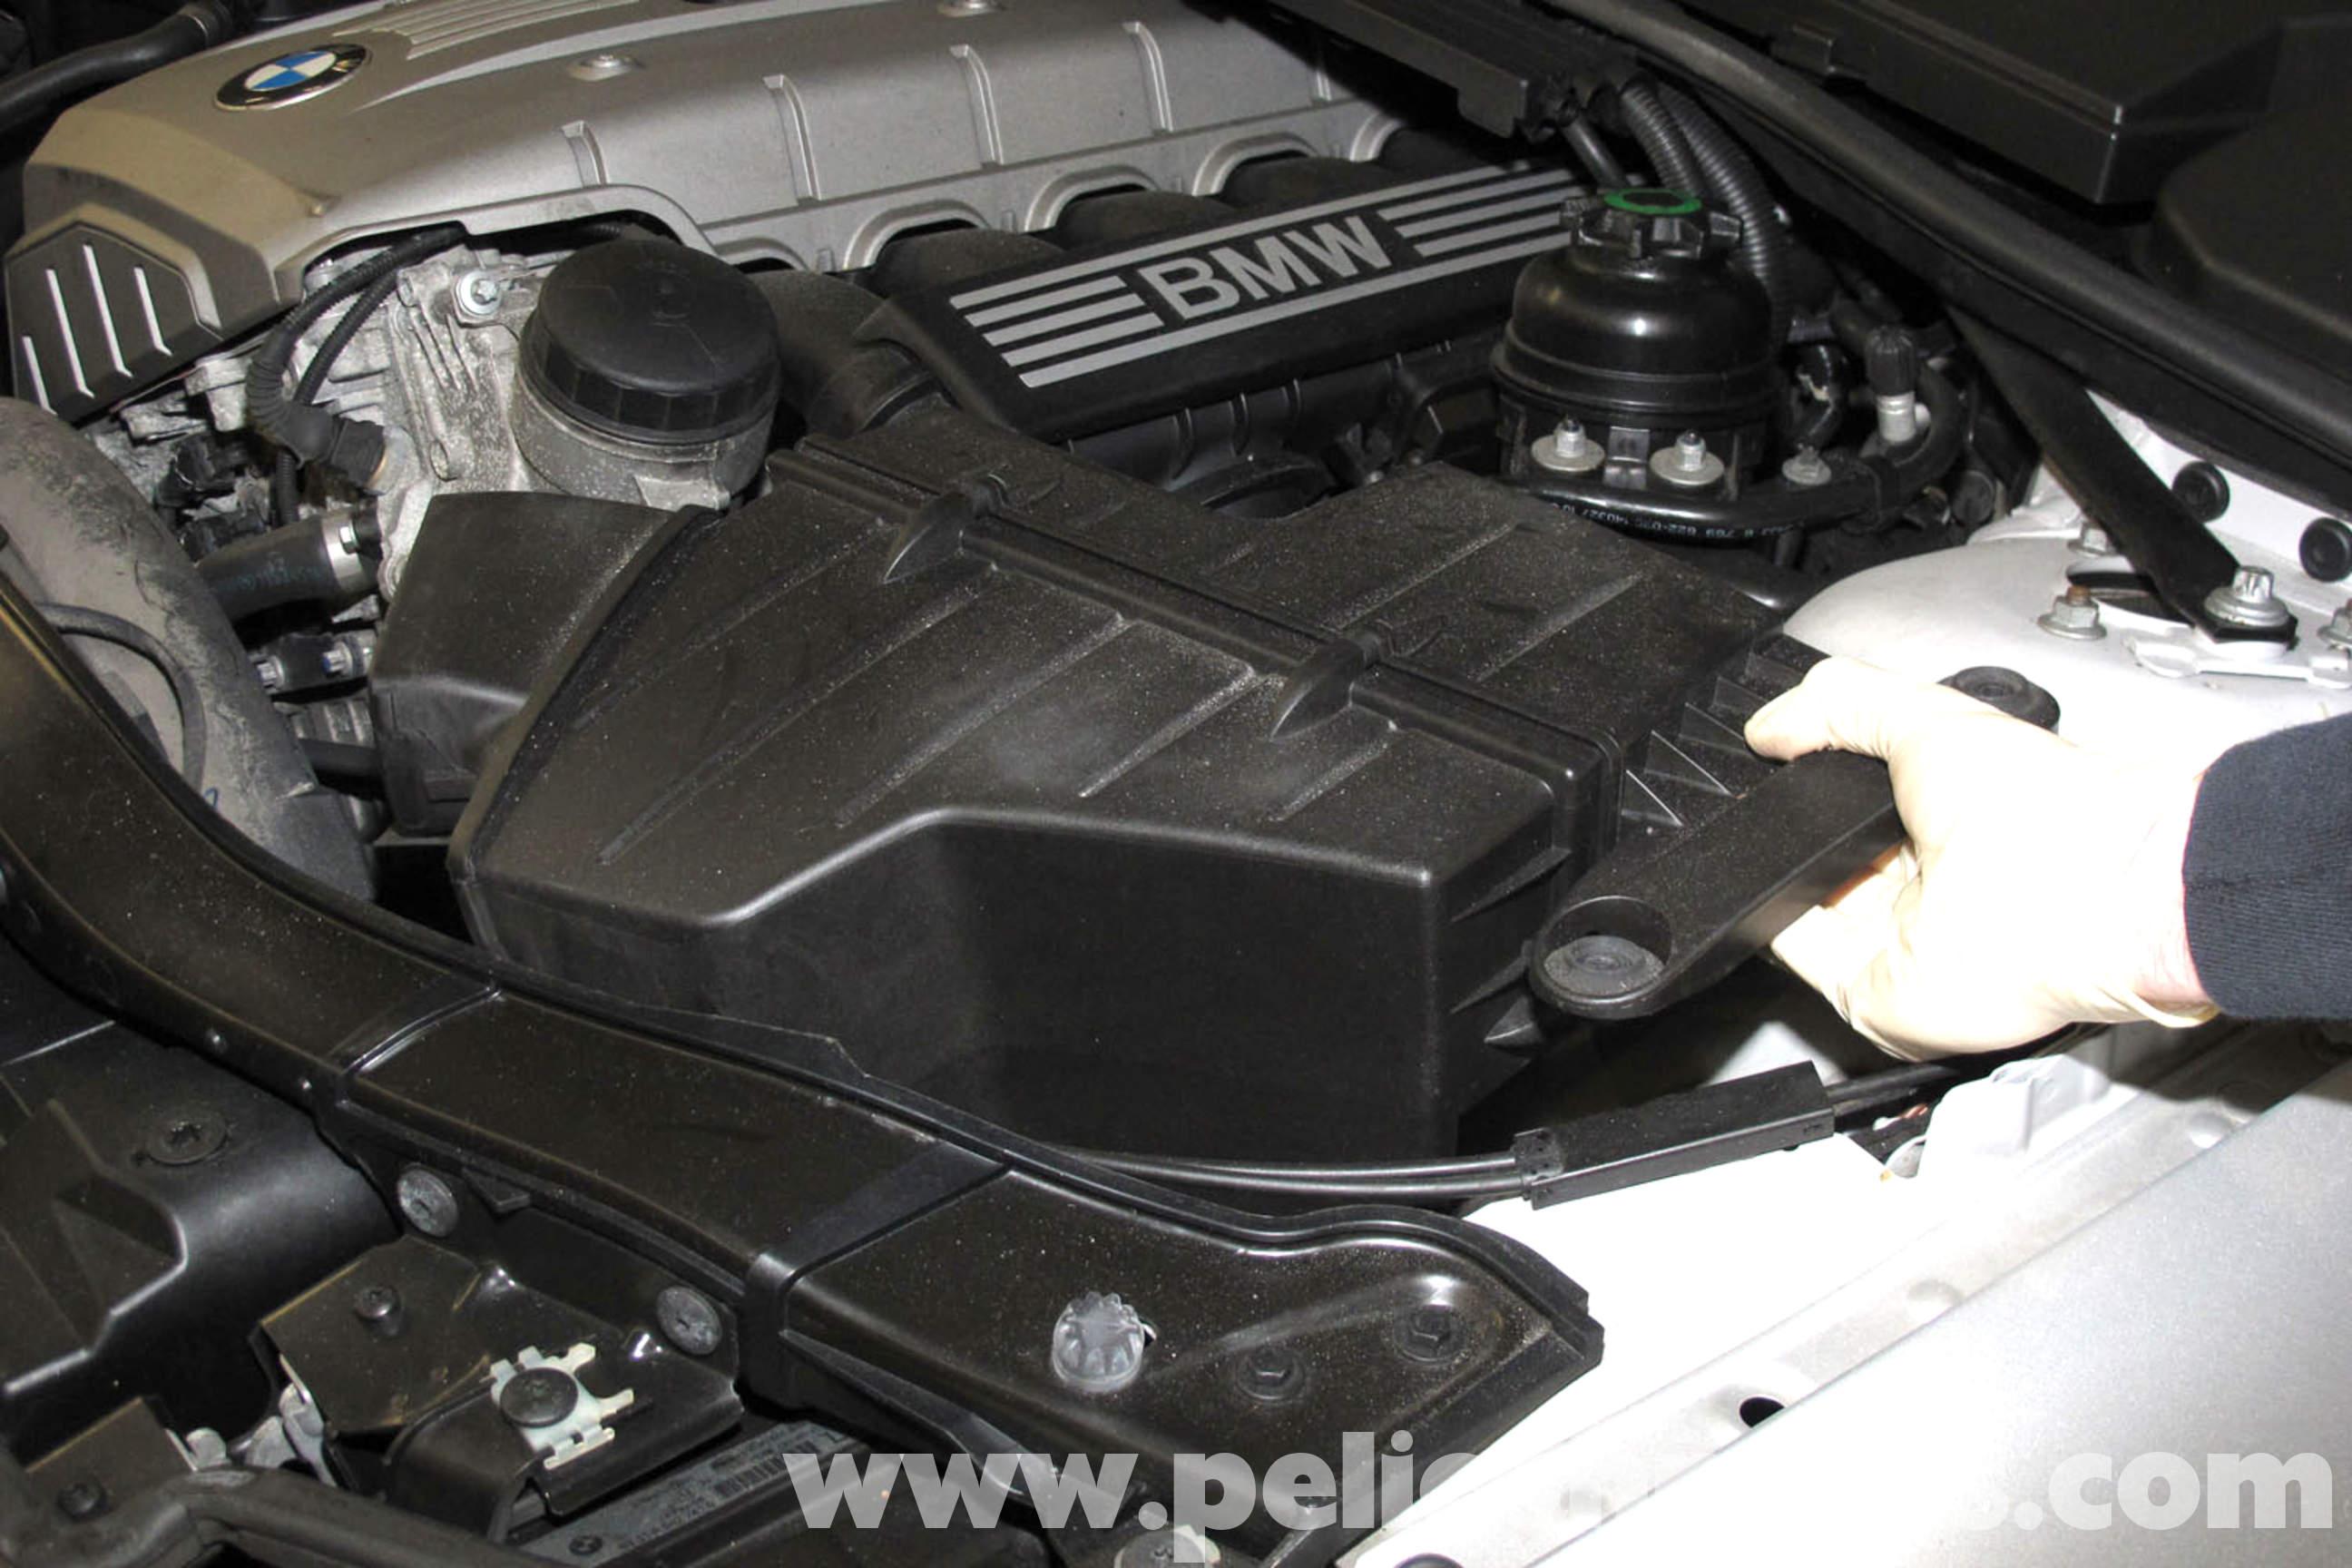 BMW E90 Throttle Body Replacement | E91, E92, E93 | Pelican Parts